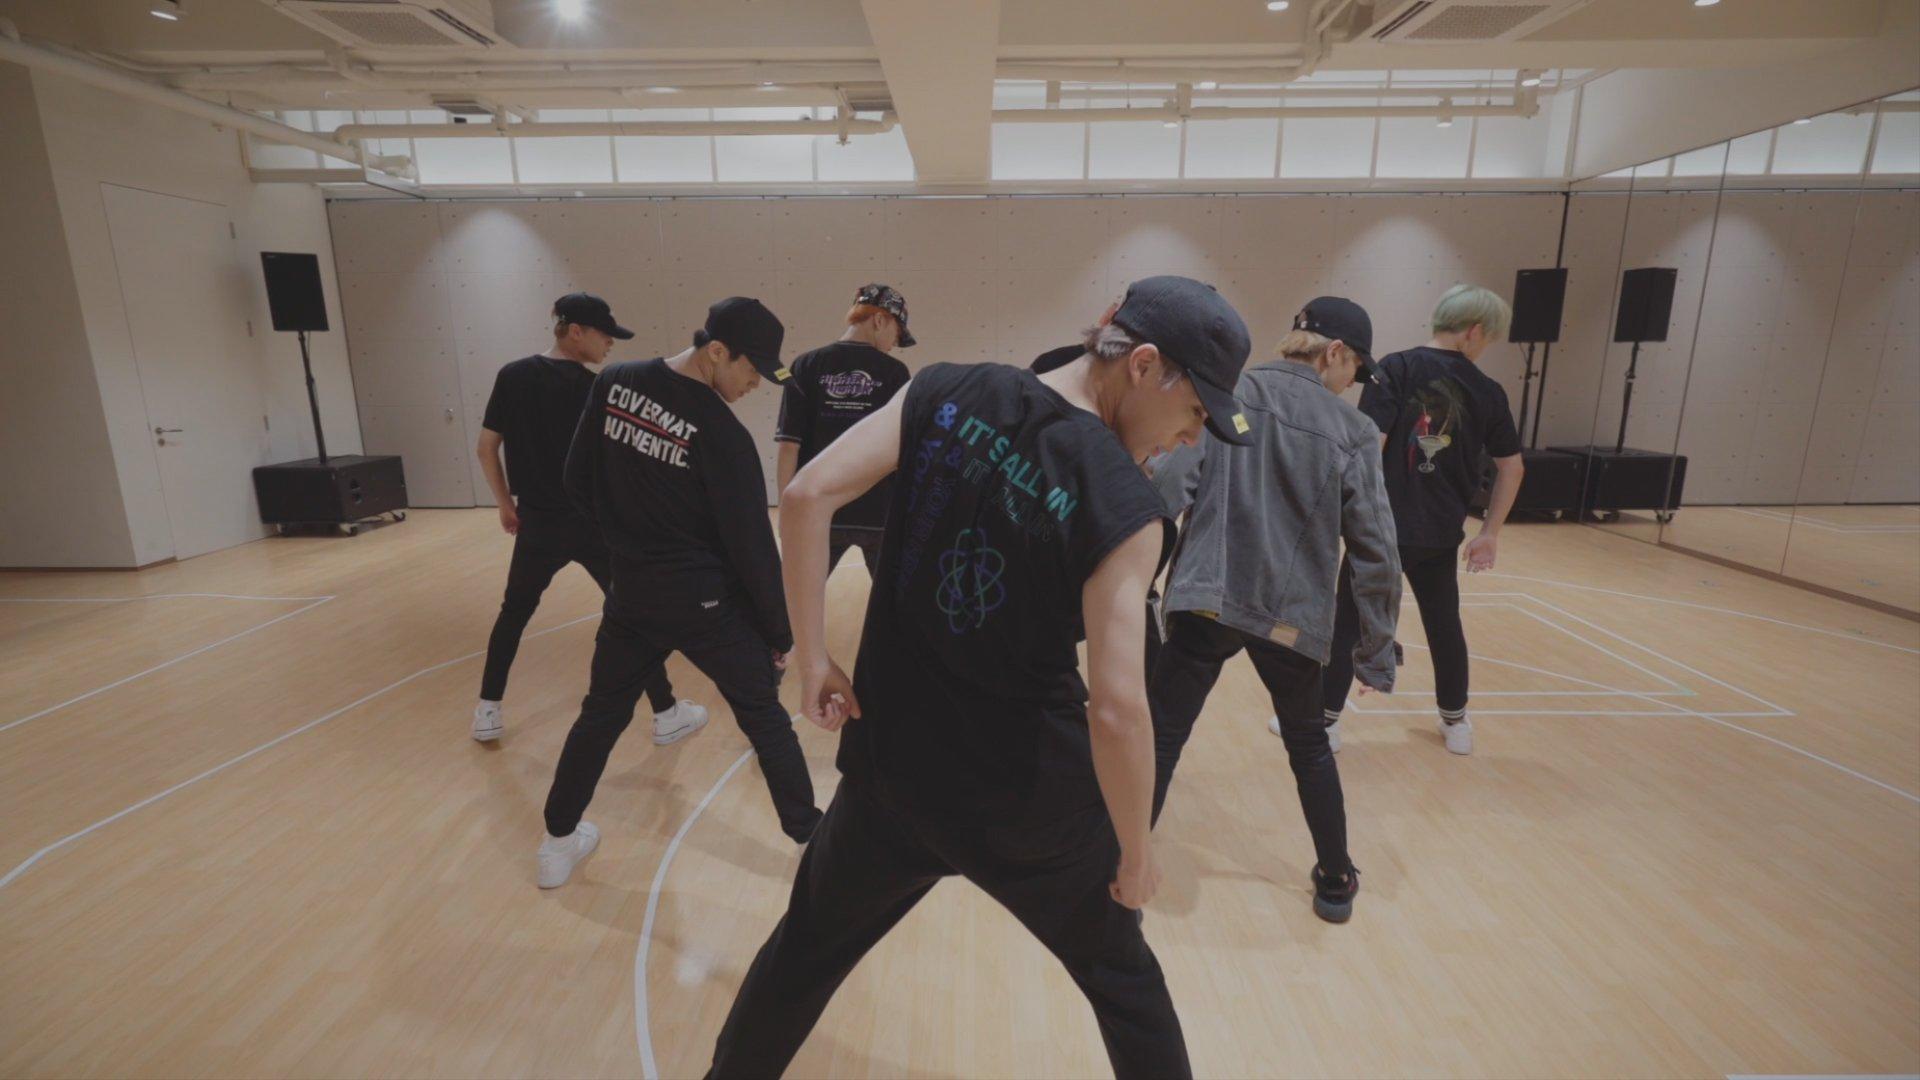 NCT DREAM 'We Go Up' Dance Practice  #NCTDREAM  #NCTDREAM_WeGoUp #WeGoUp #WE_GO_UP #DancePractice   #NCT https://t.co/u366eUBdSB